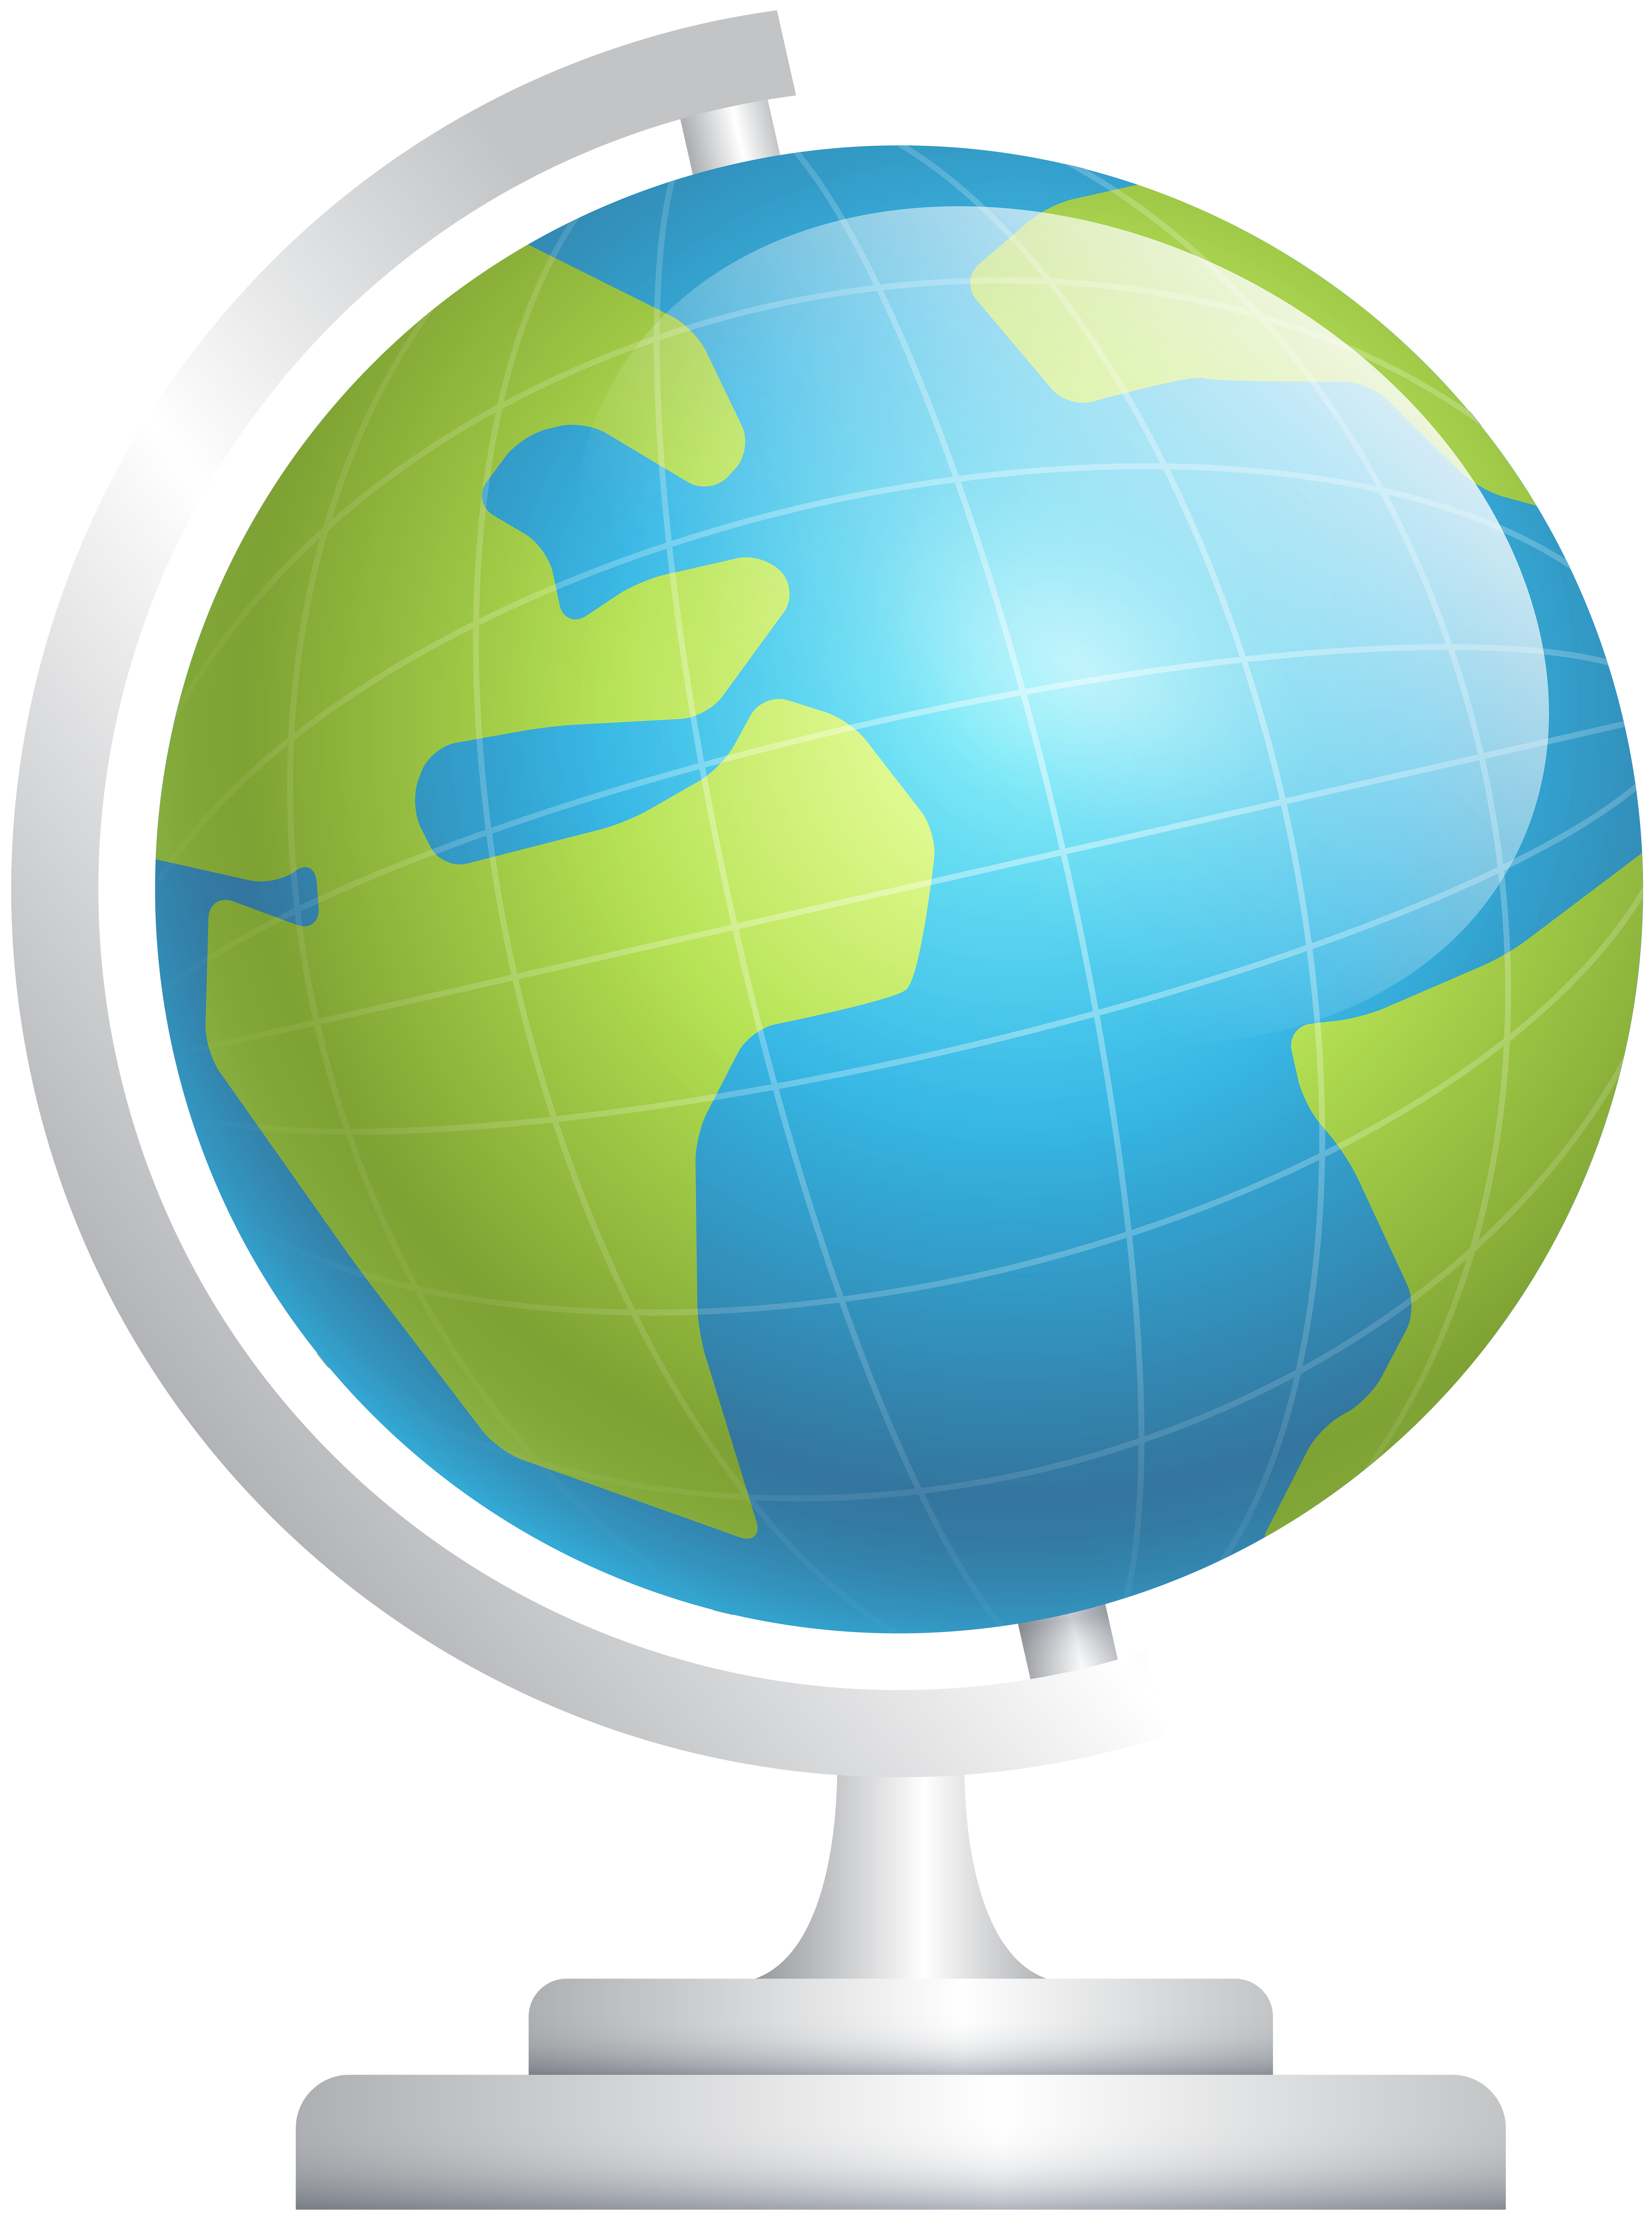 Clipart earth high resolution. Globe clip art image